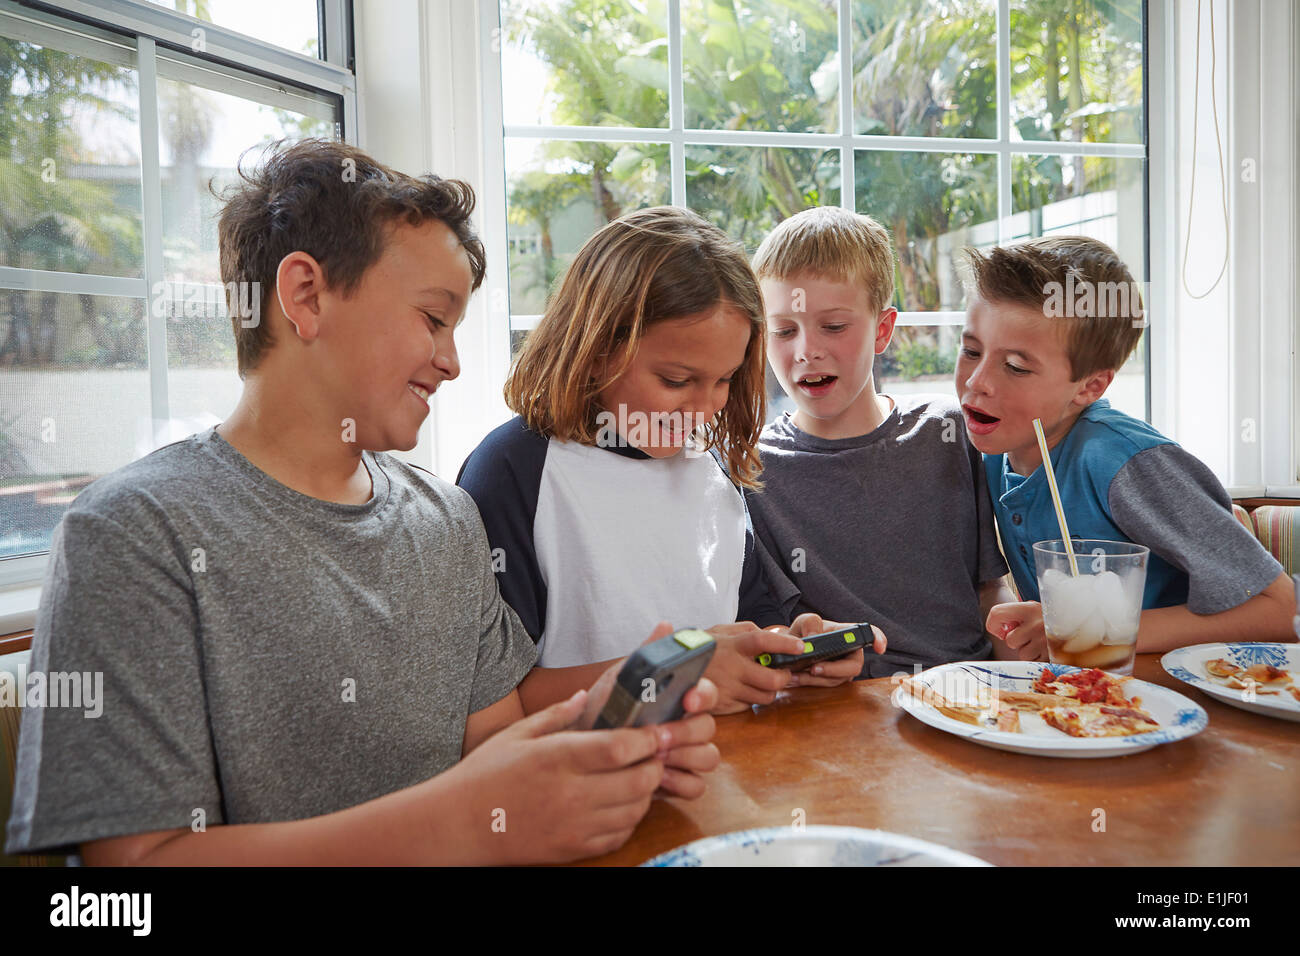 Boys playing handheld video games - Stock Image